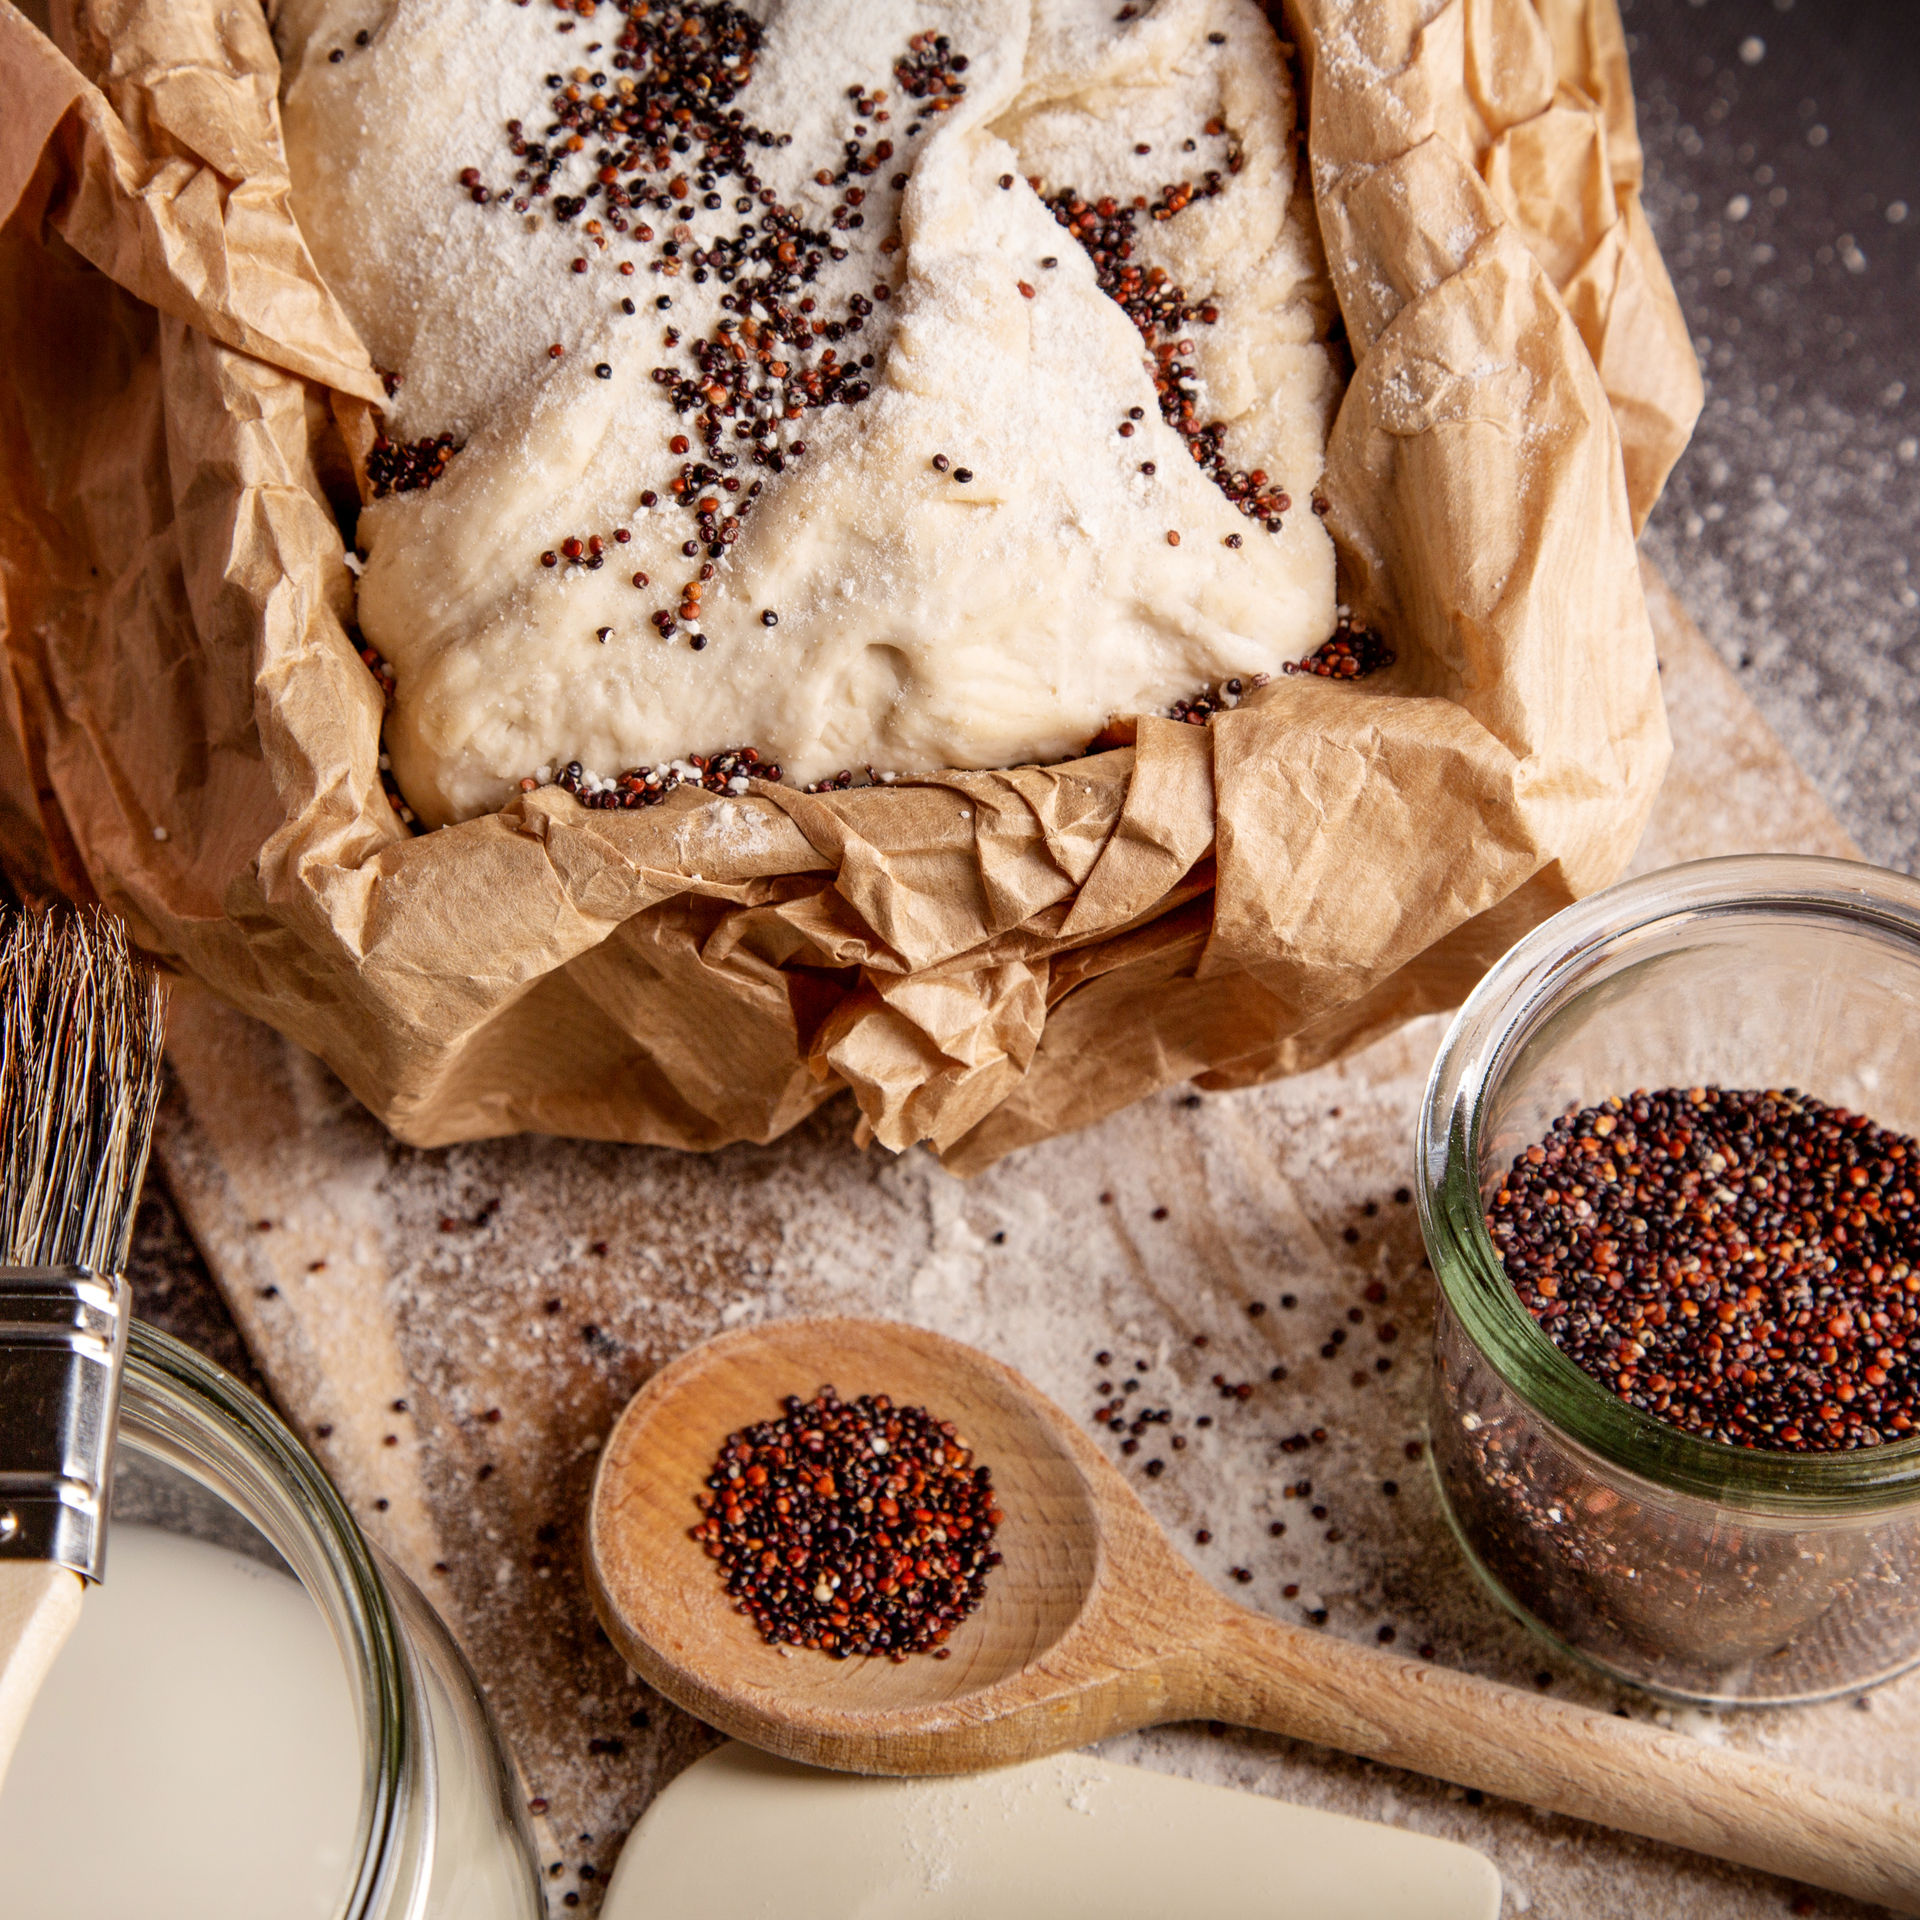 Foodfotografie7.jpg